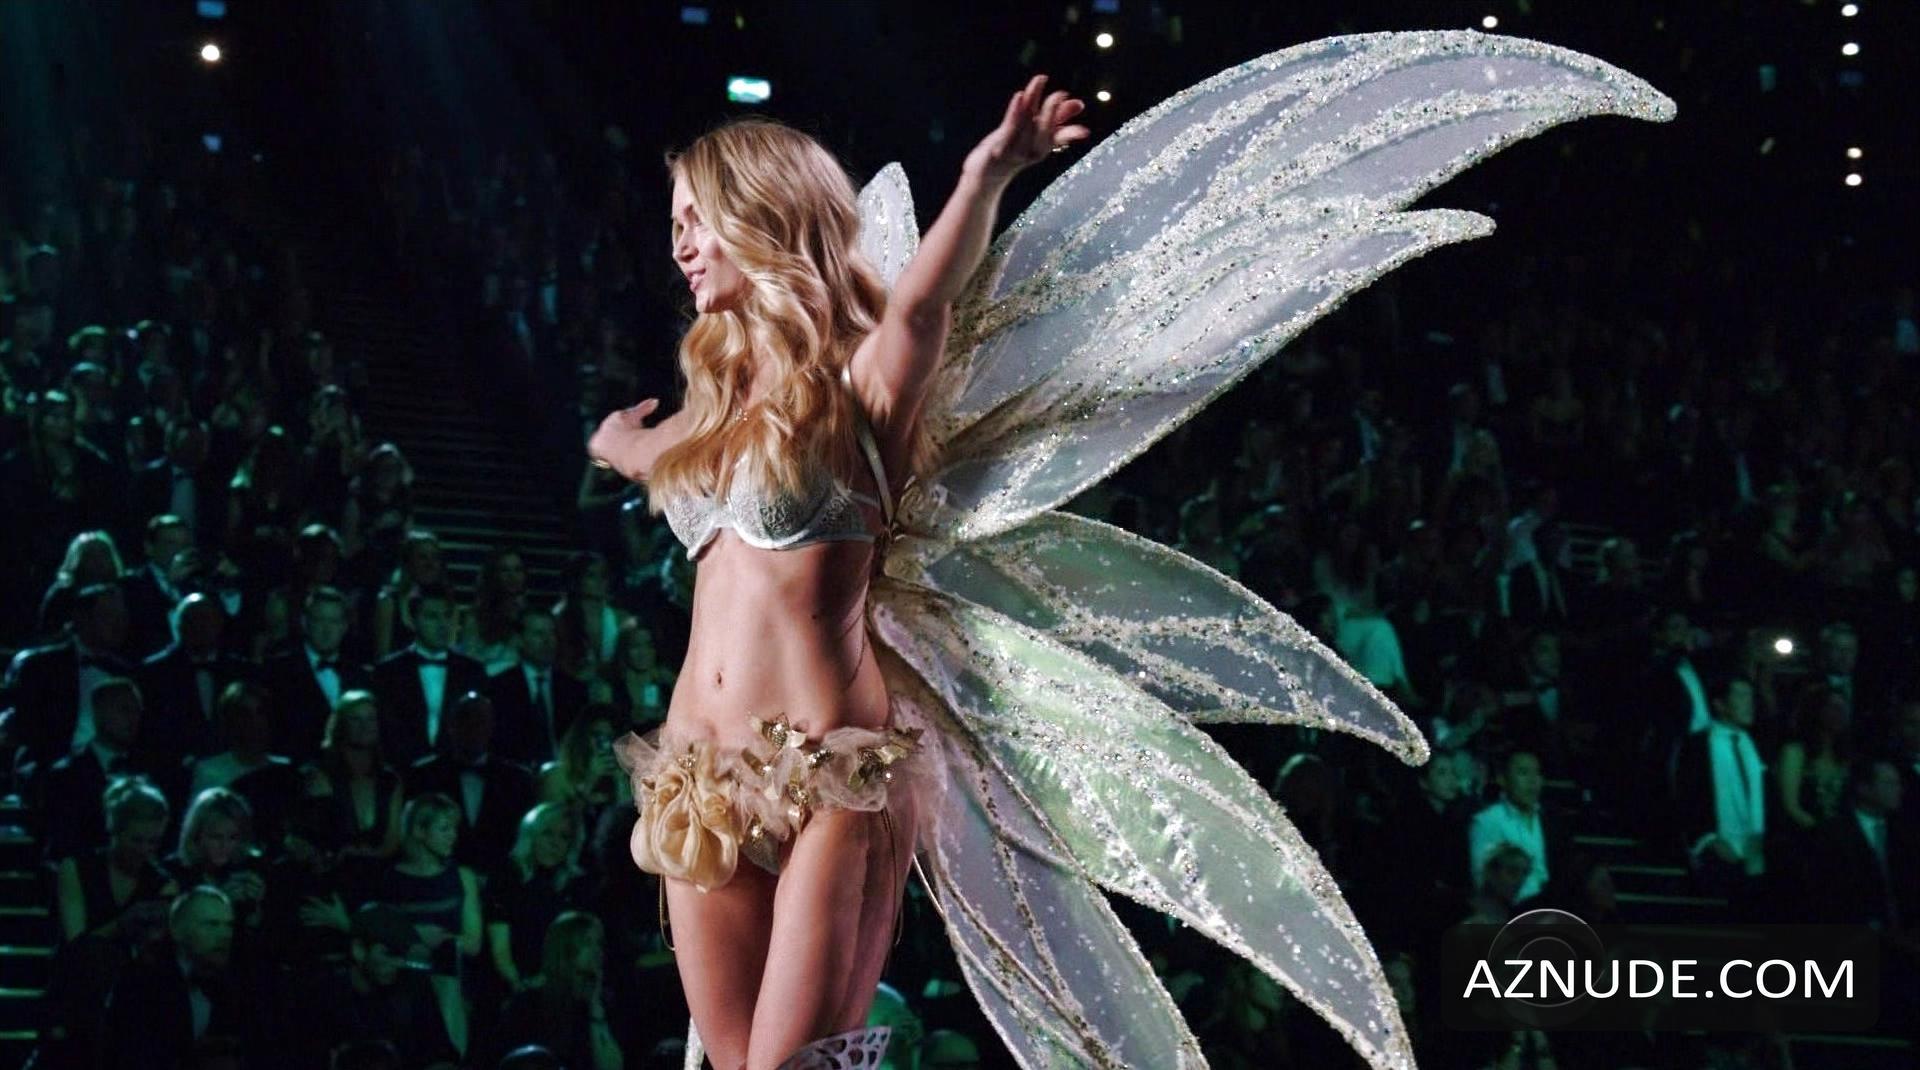 Alia de angelis total romance 5